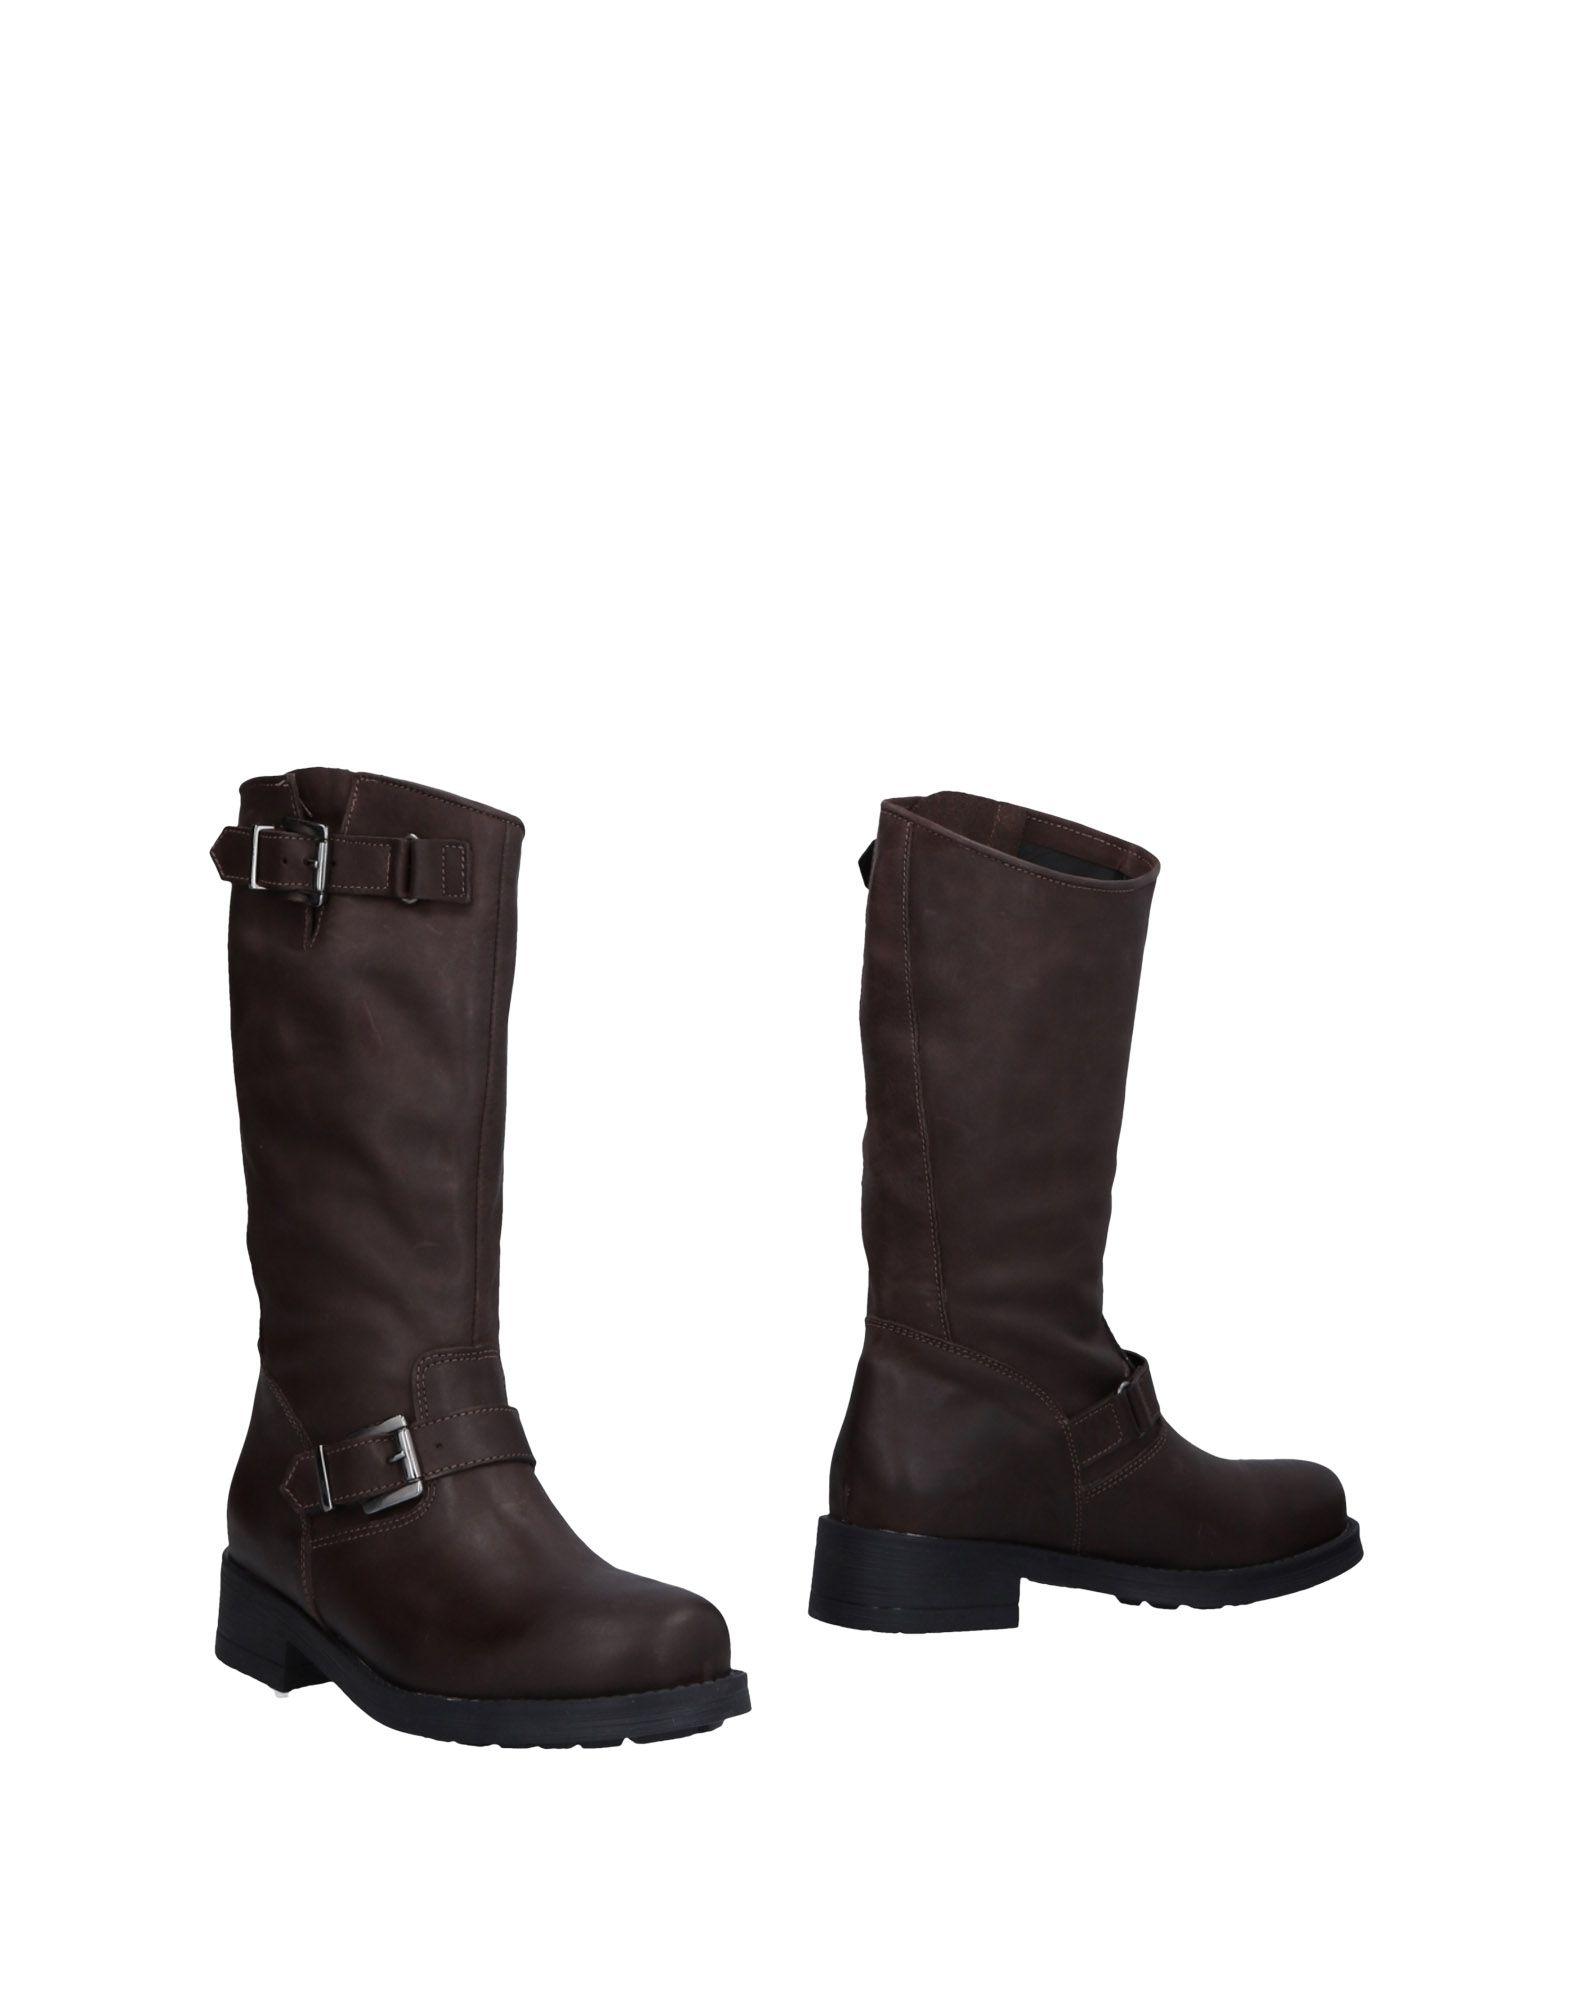 Moda Stivali Stivali Moda Unlace Donna - 11473926MM a43f84